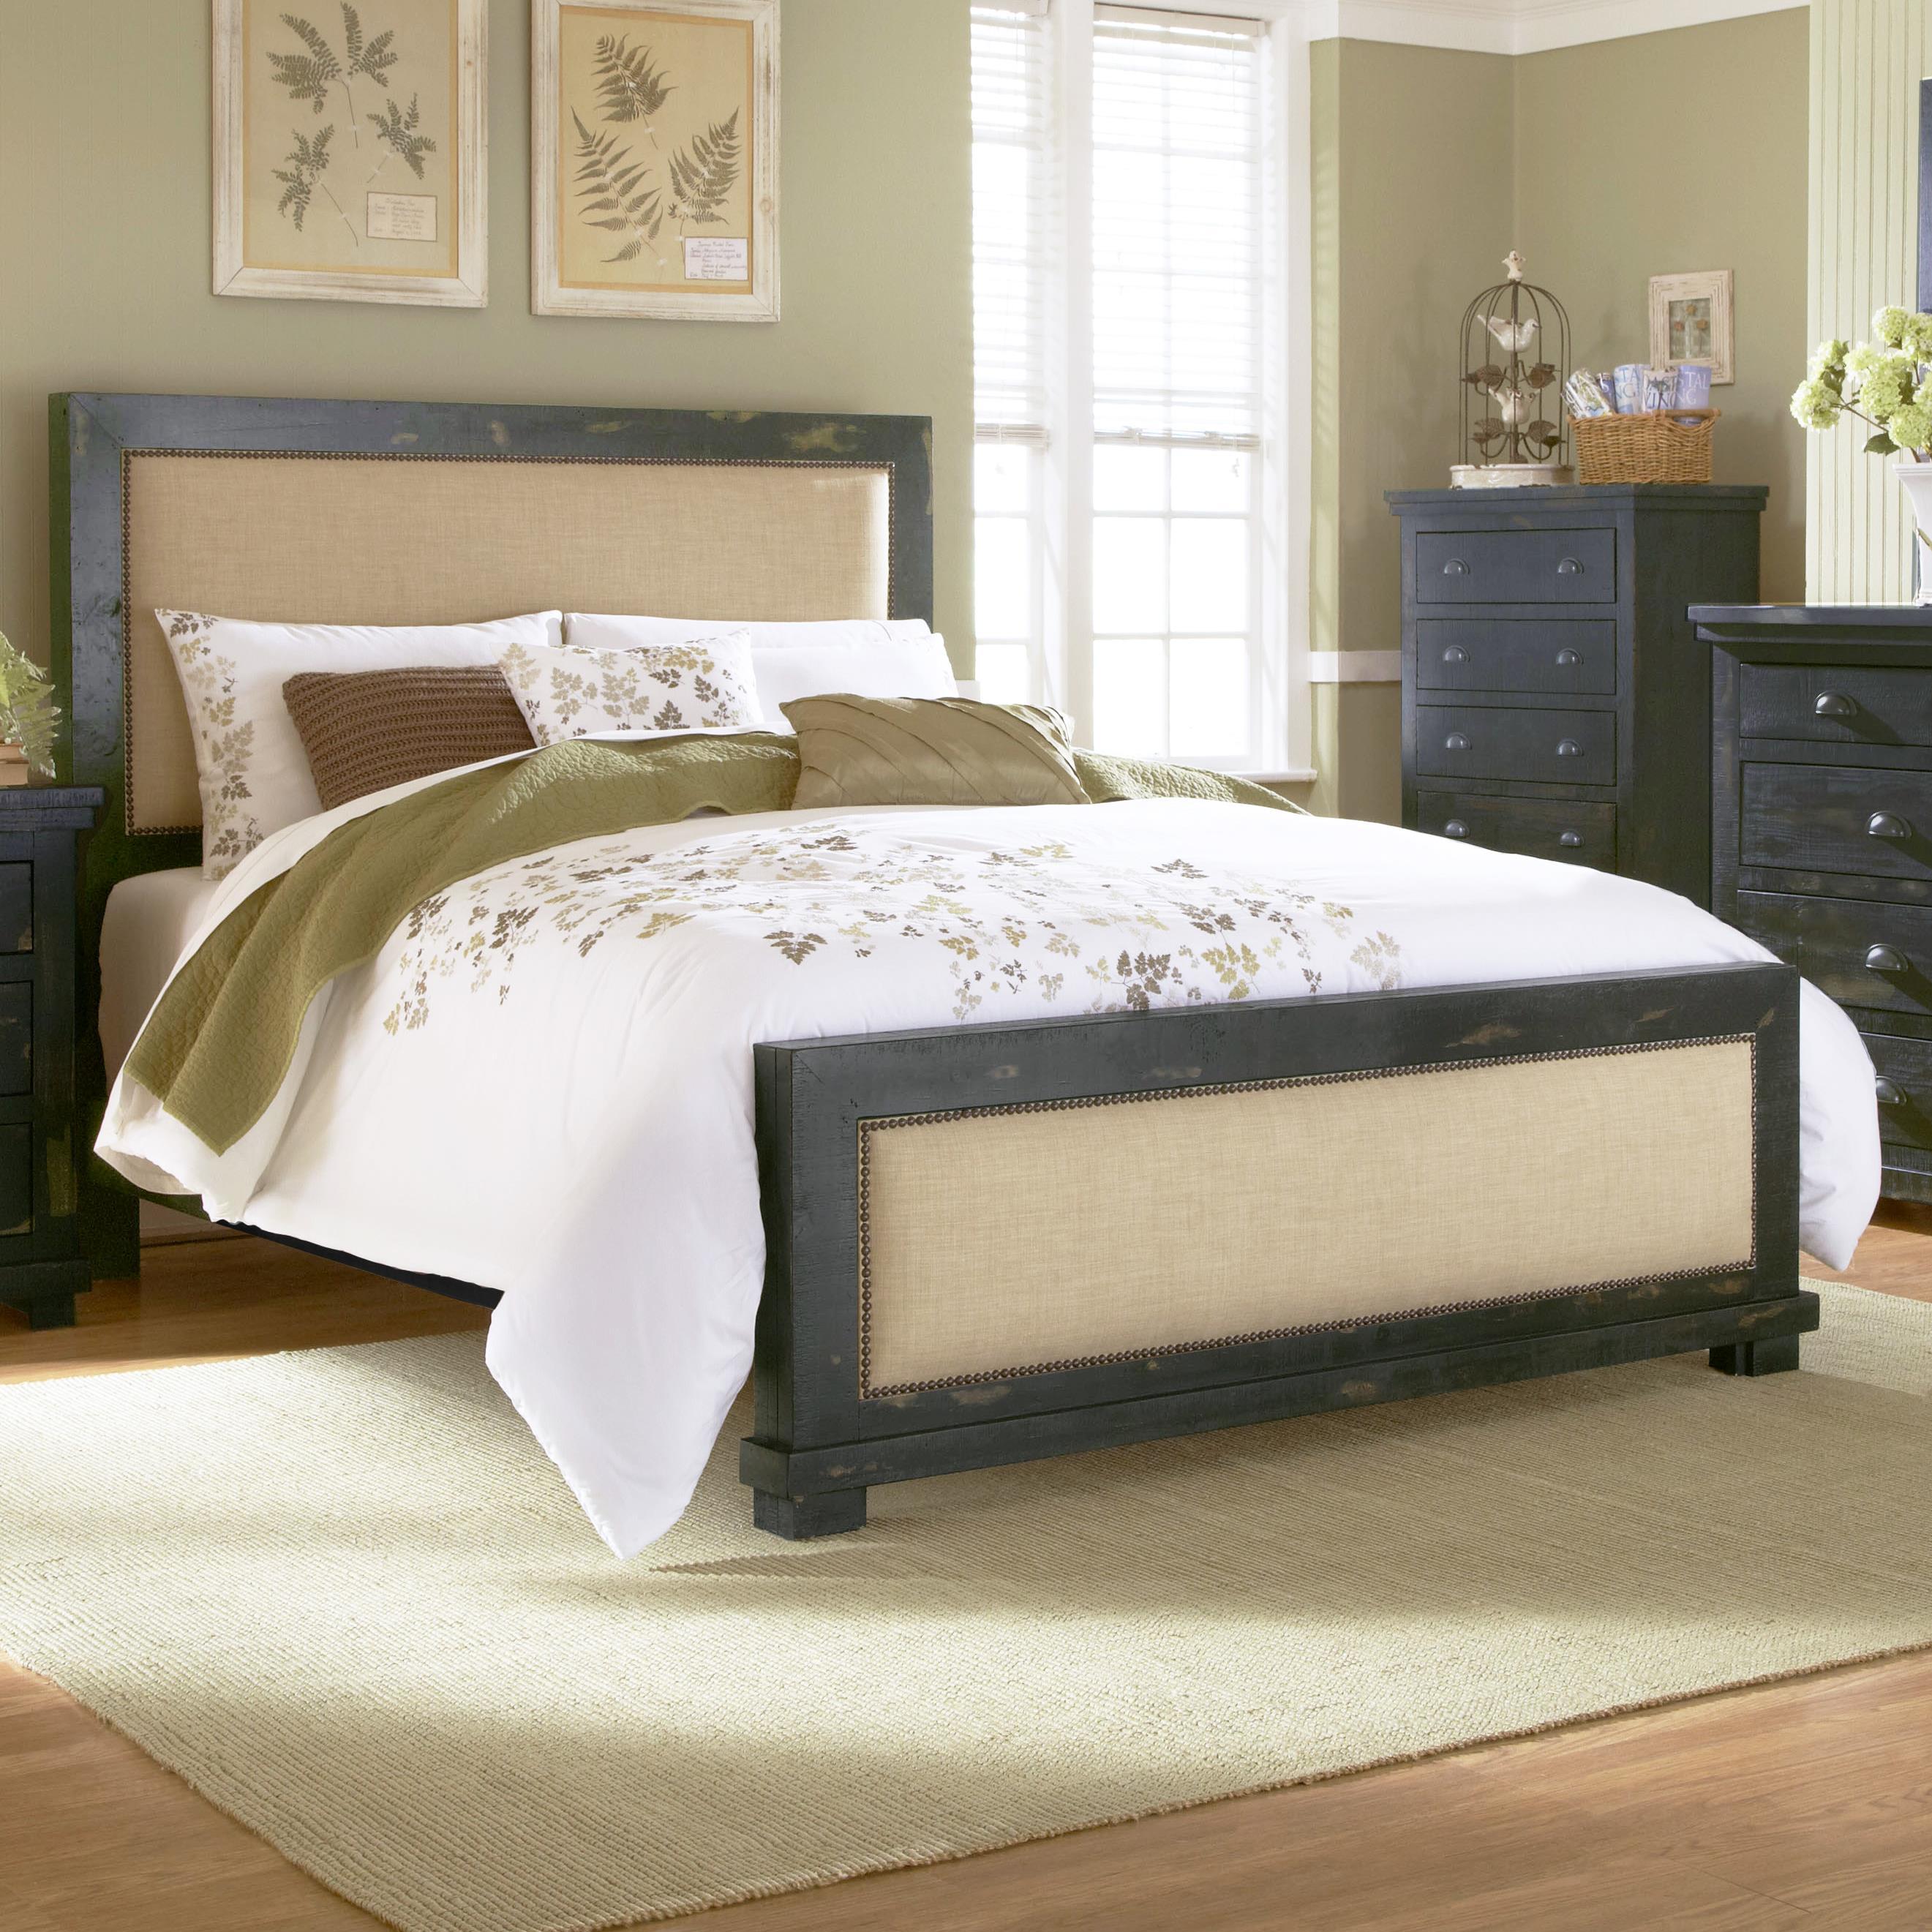 Progressive Furniture Willow Queen Upholstered Bed - Item Number: P612-34+35+78